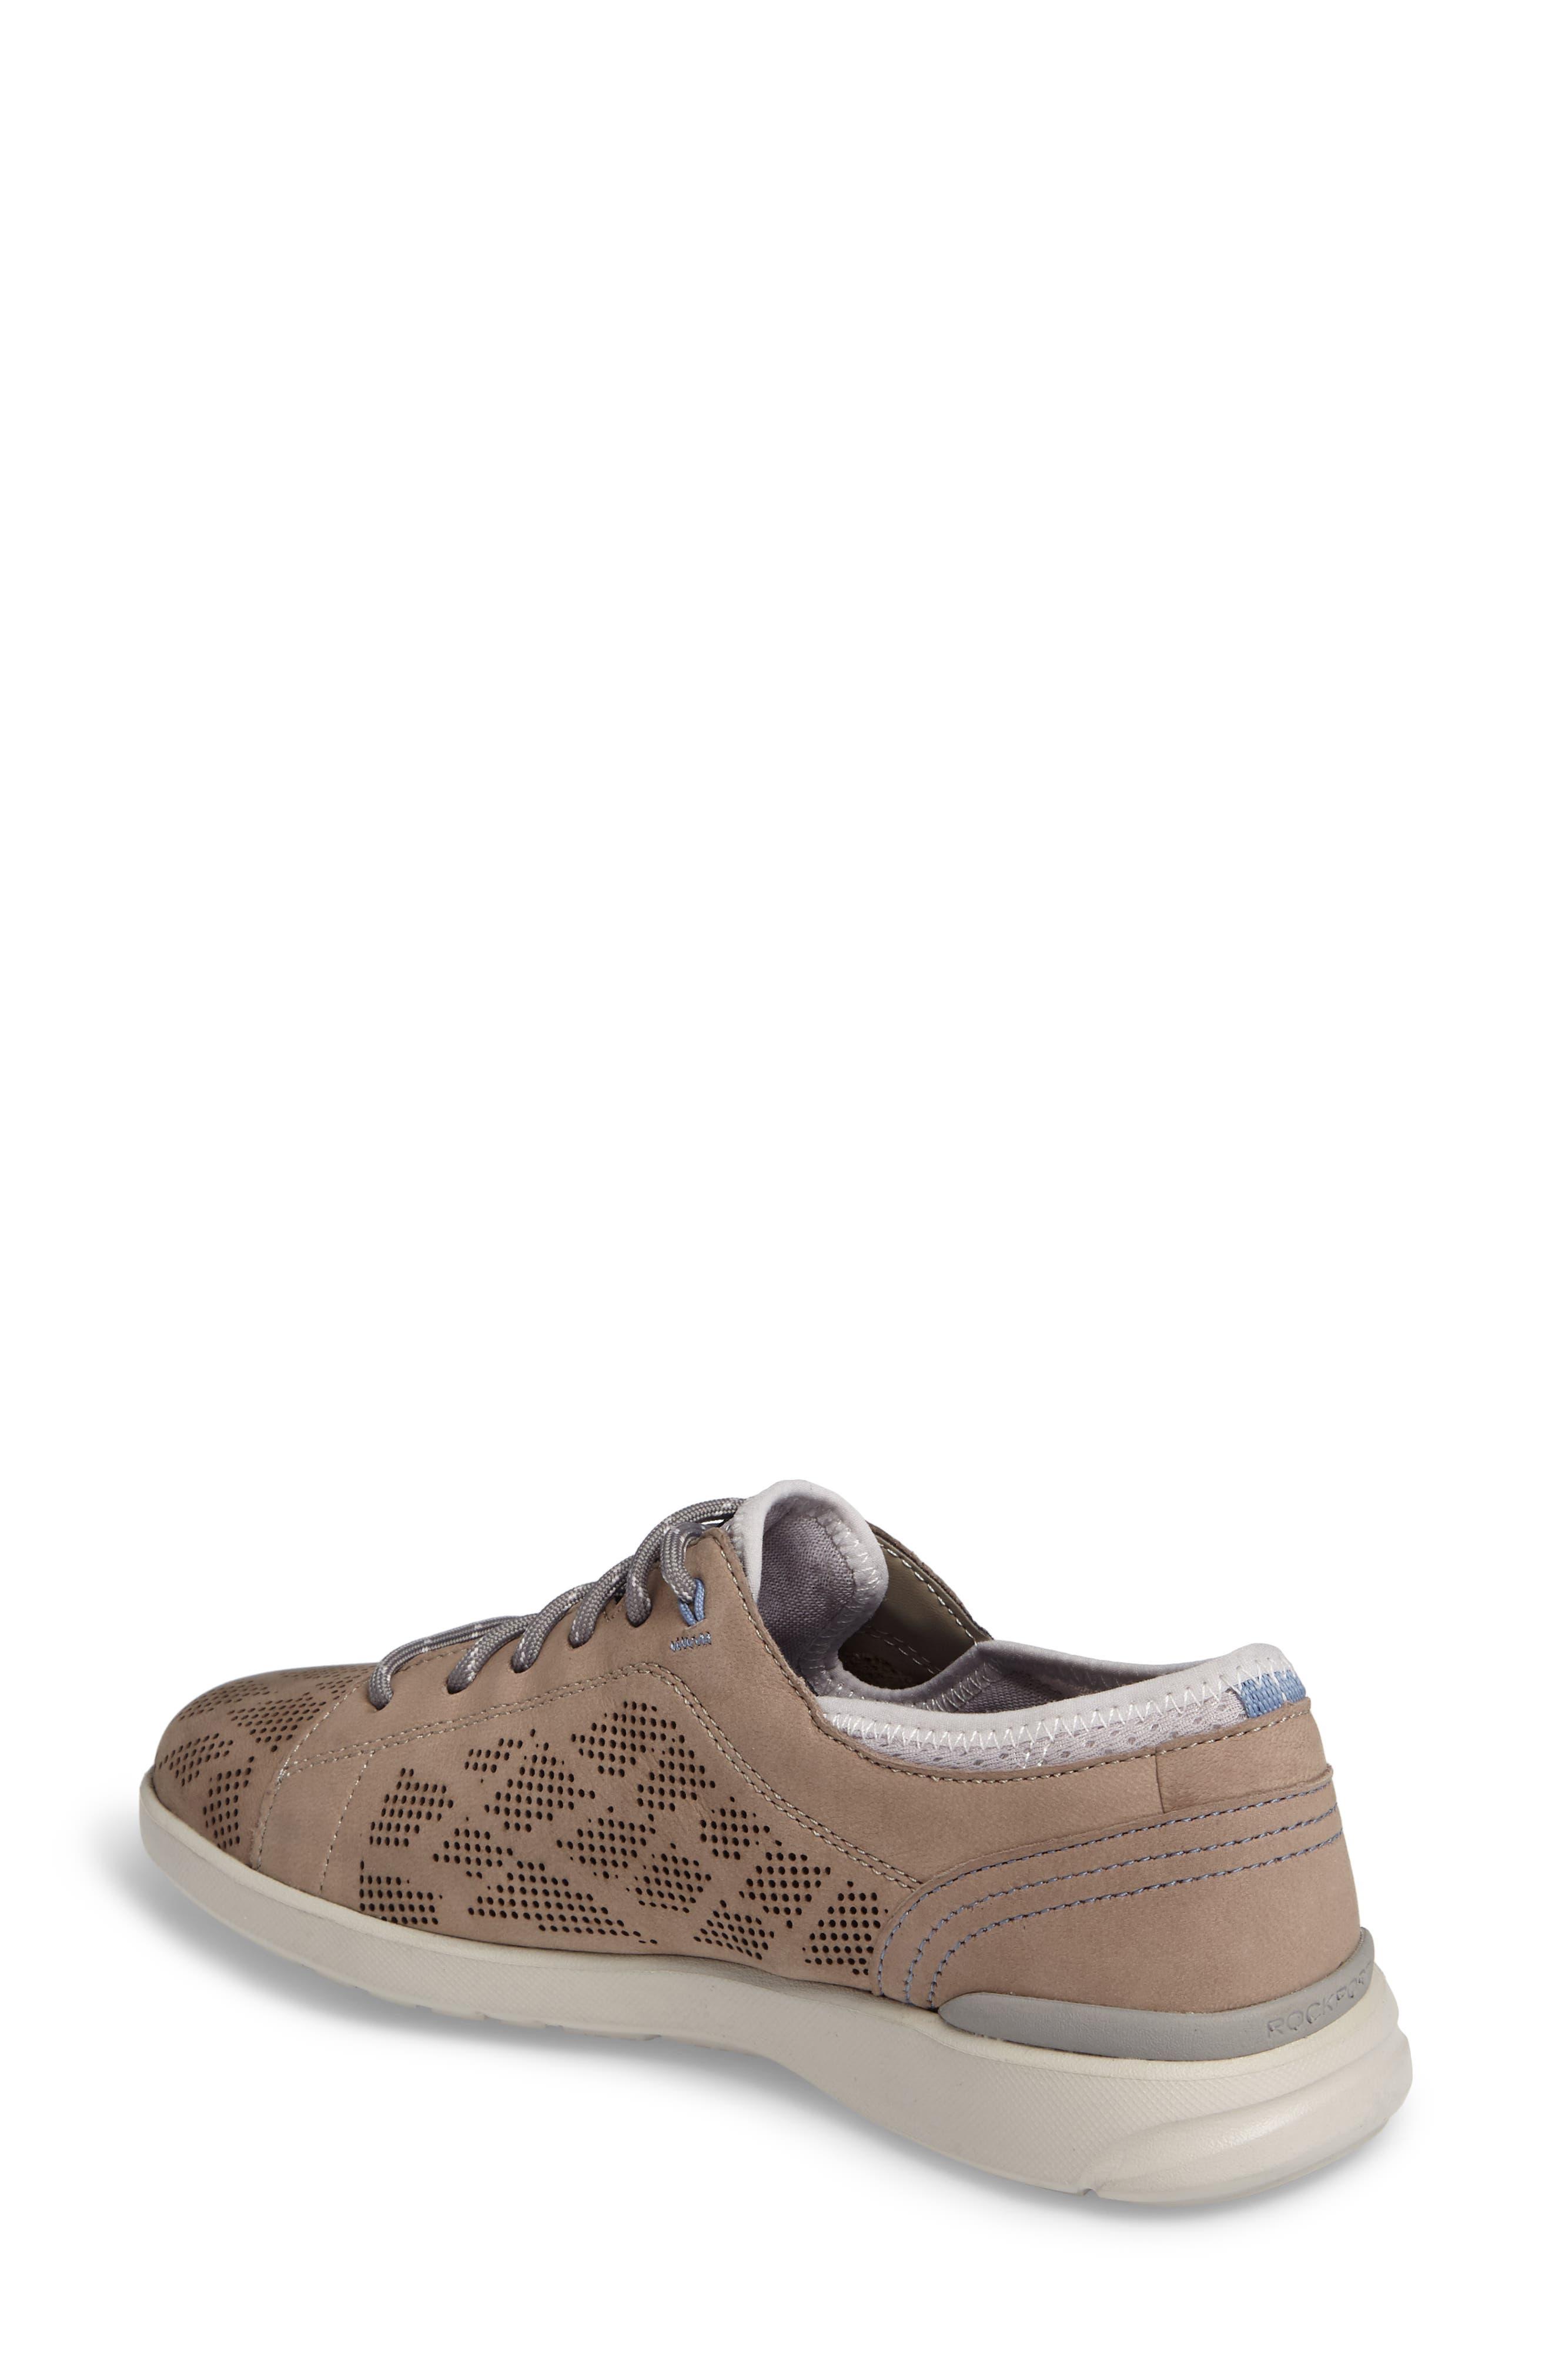 Alternate Image 2  - Rockport truFLEX Perforated Sneaker (Women)